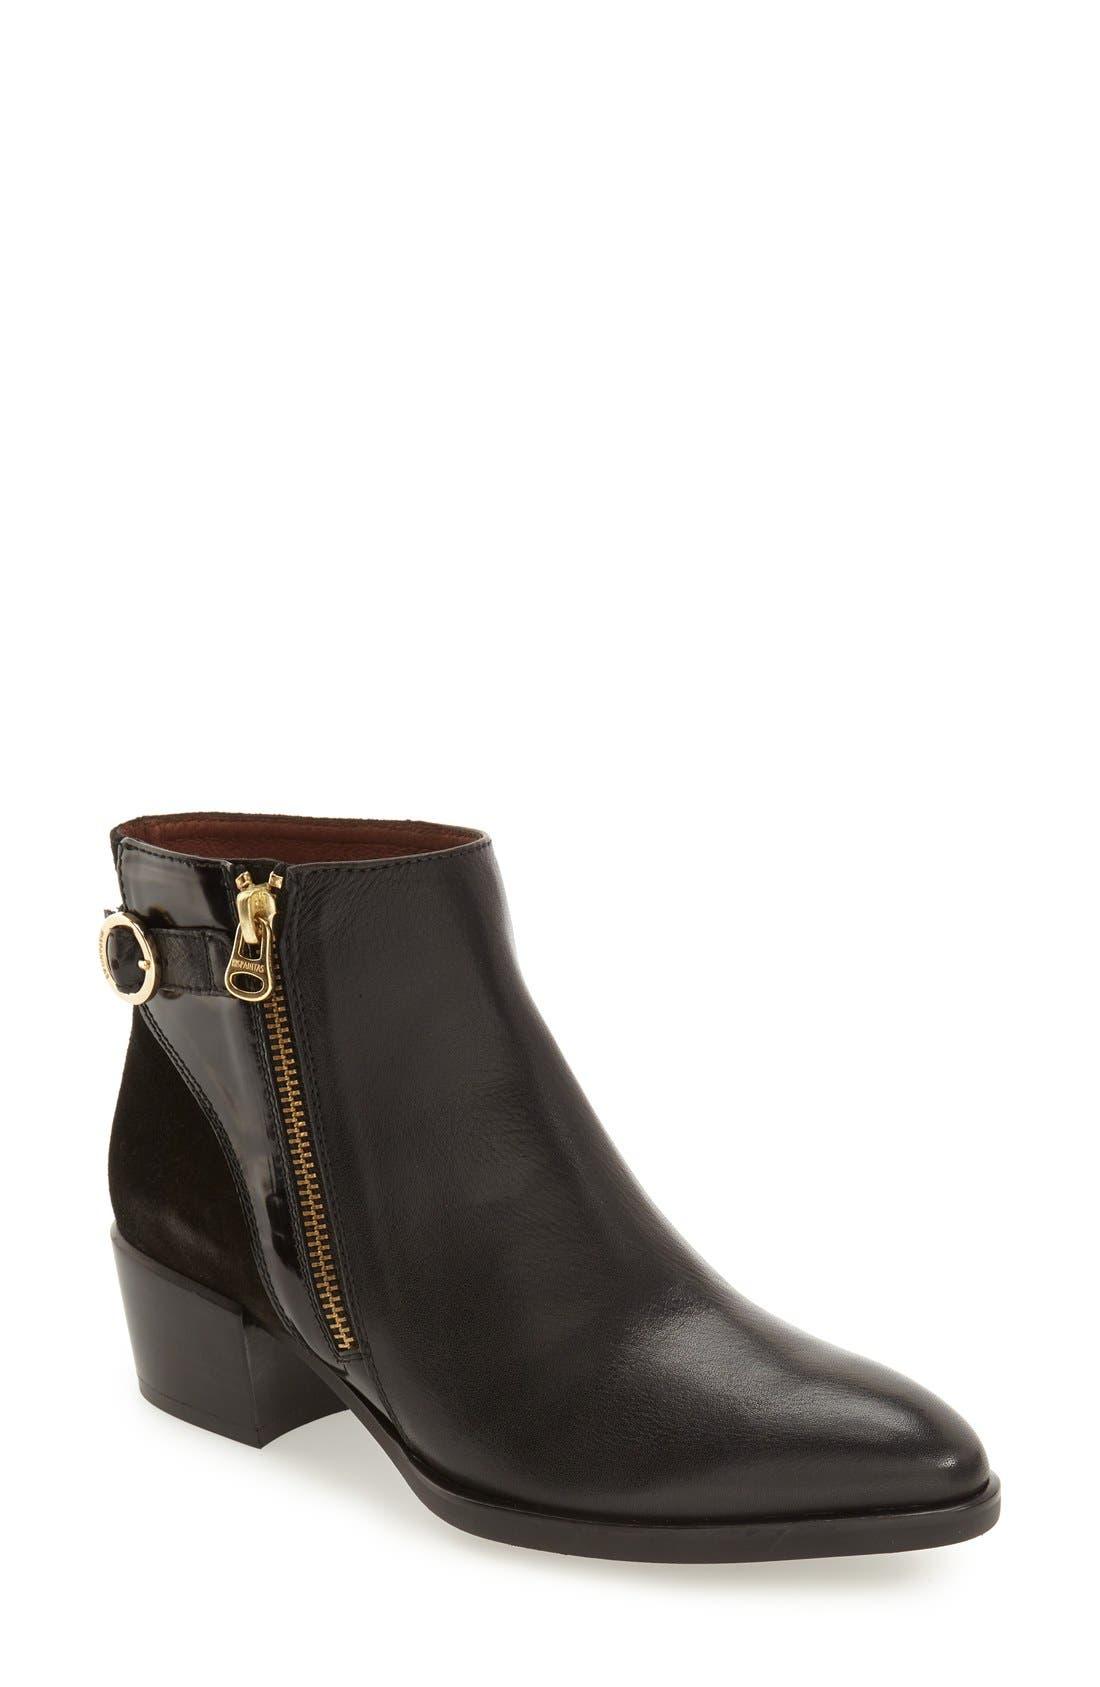 Lakisha Block Heel Bootie,                         Main,                         color, Black Leather